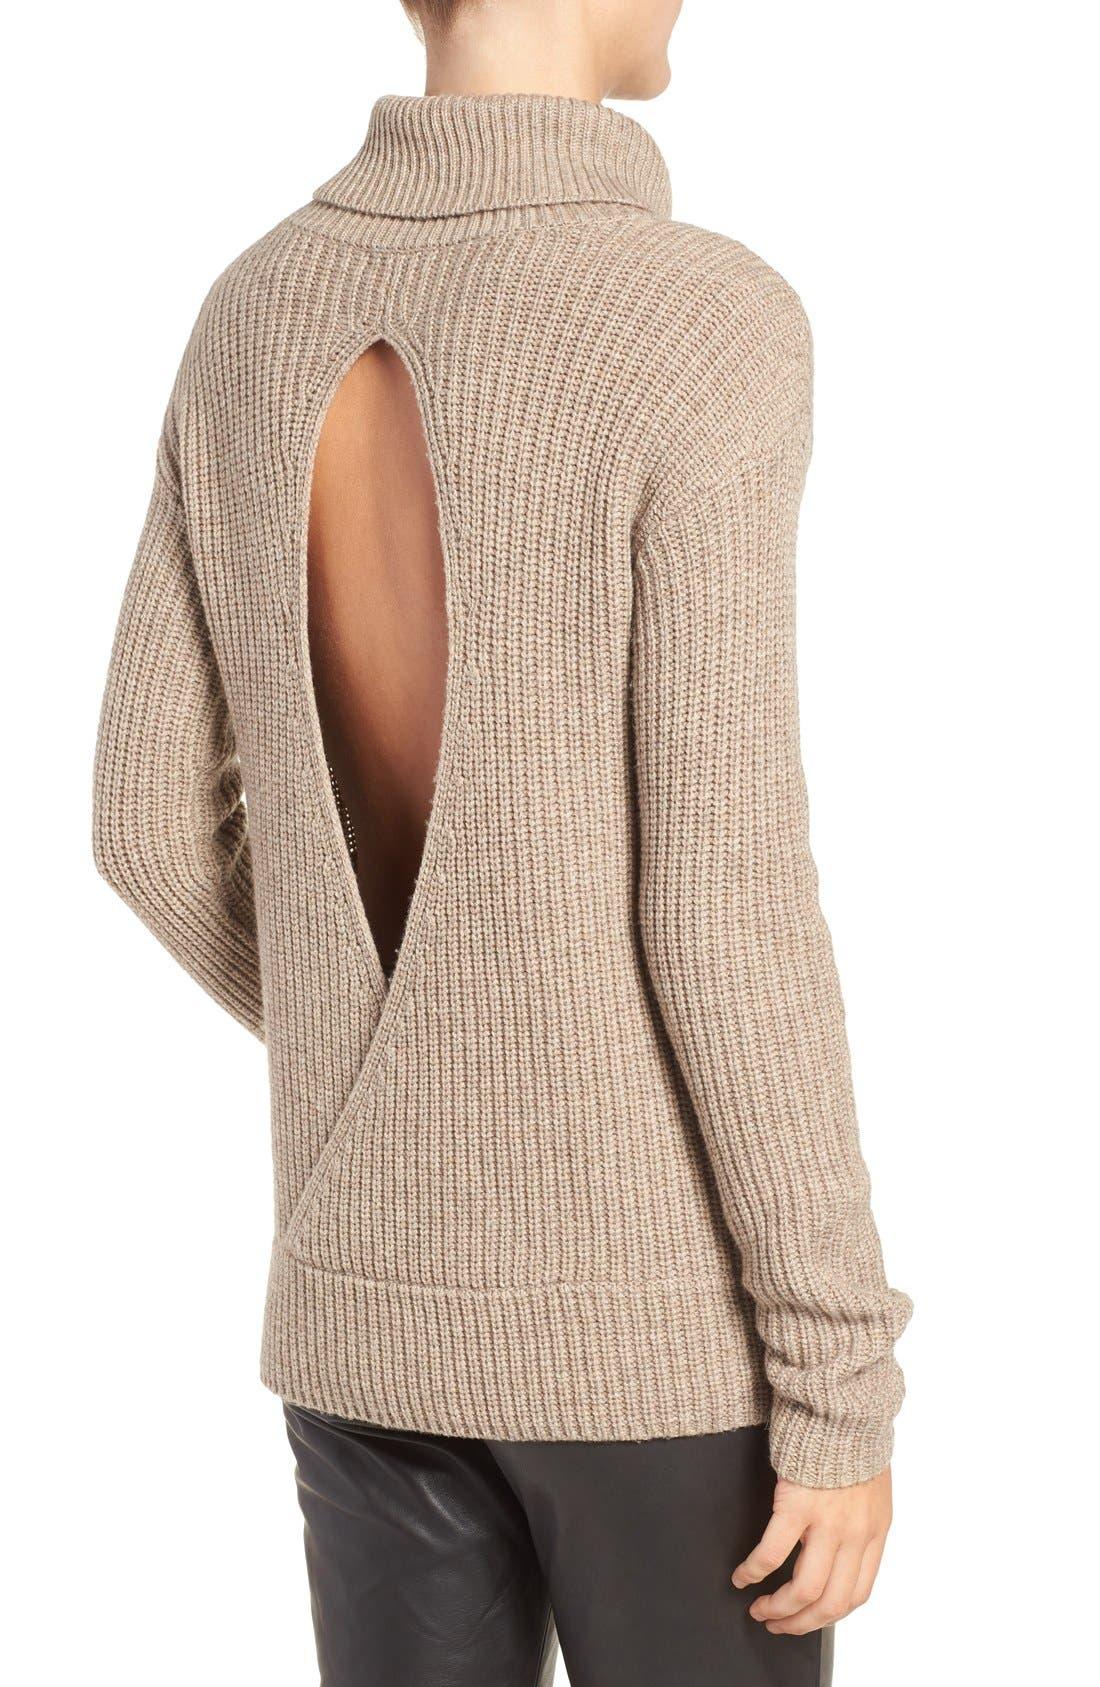 Main Image - Olivia Palermo + Chelsea28 Open Back Wool & Cashmere Turtleneck Sweater